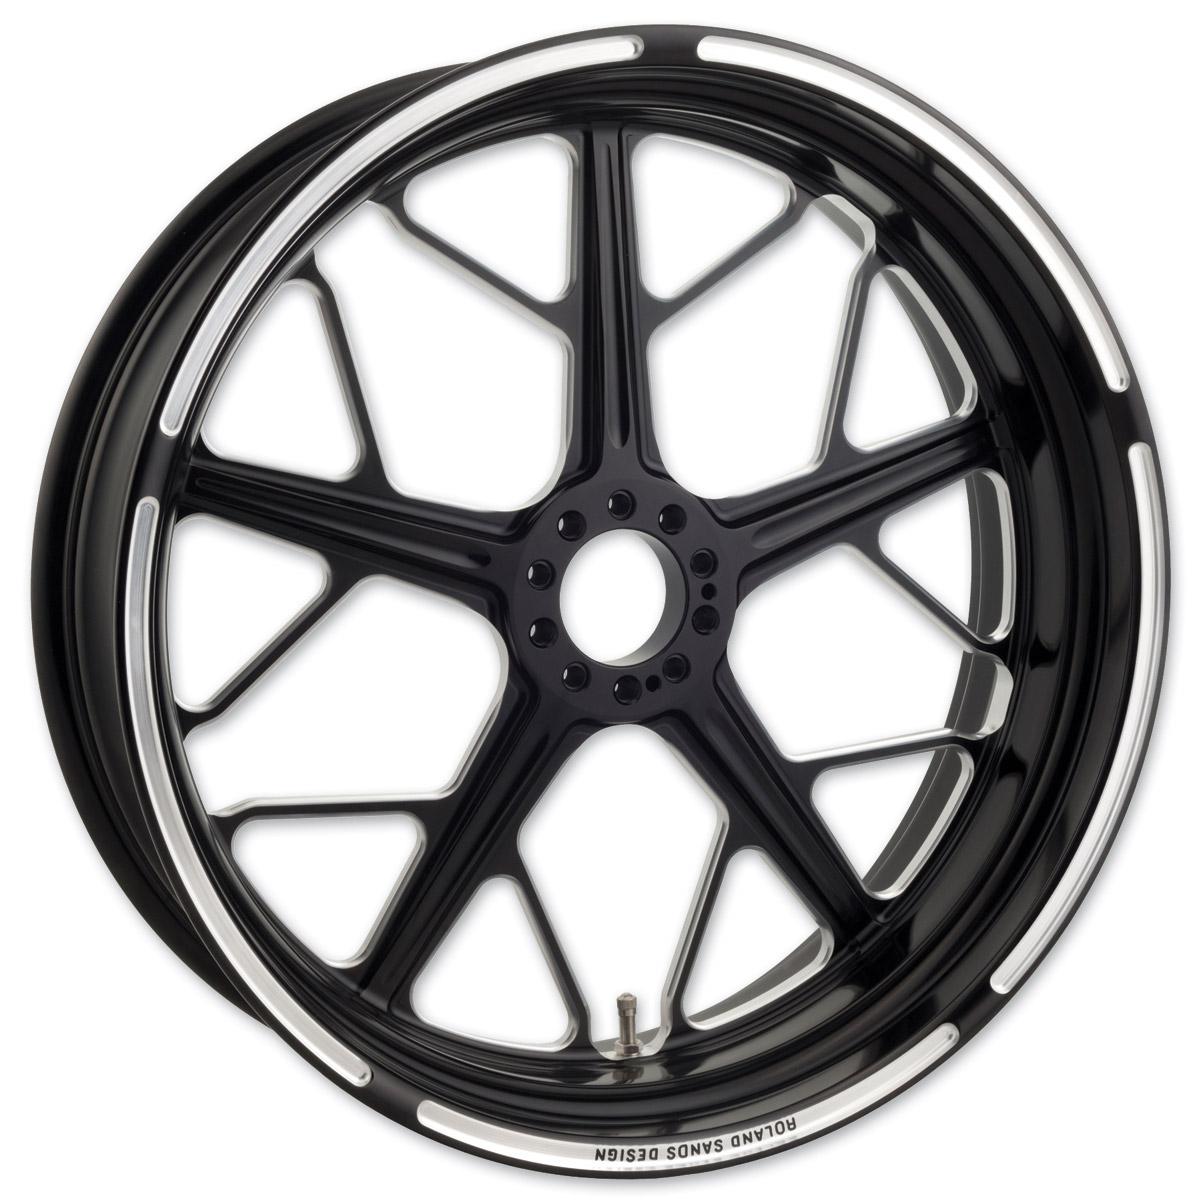 Roland Sands Design Hutch Contrast Cut ABS Rear Wheel, 17″ x 6″